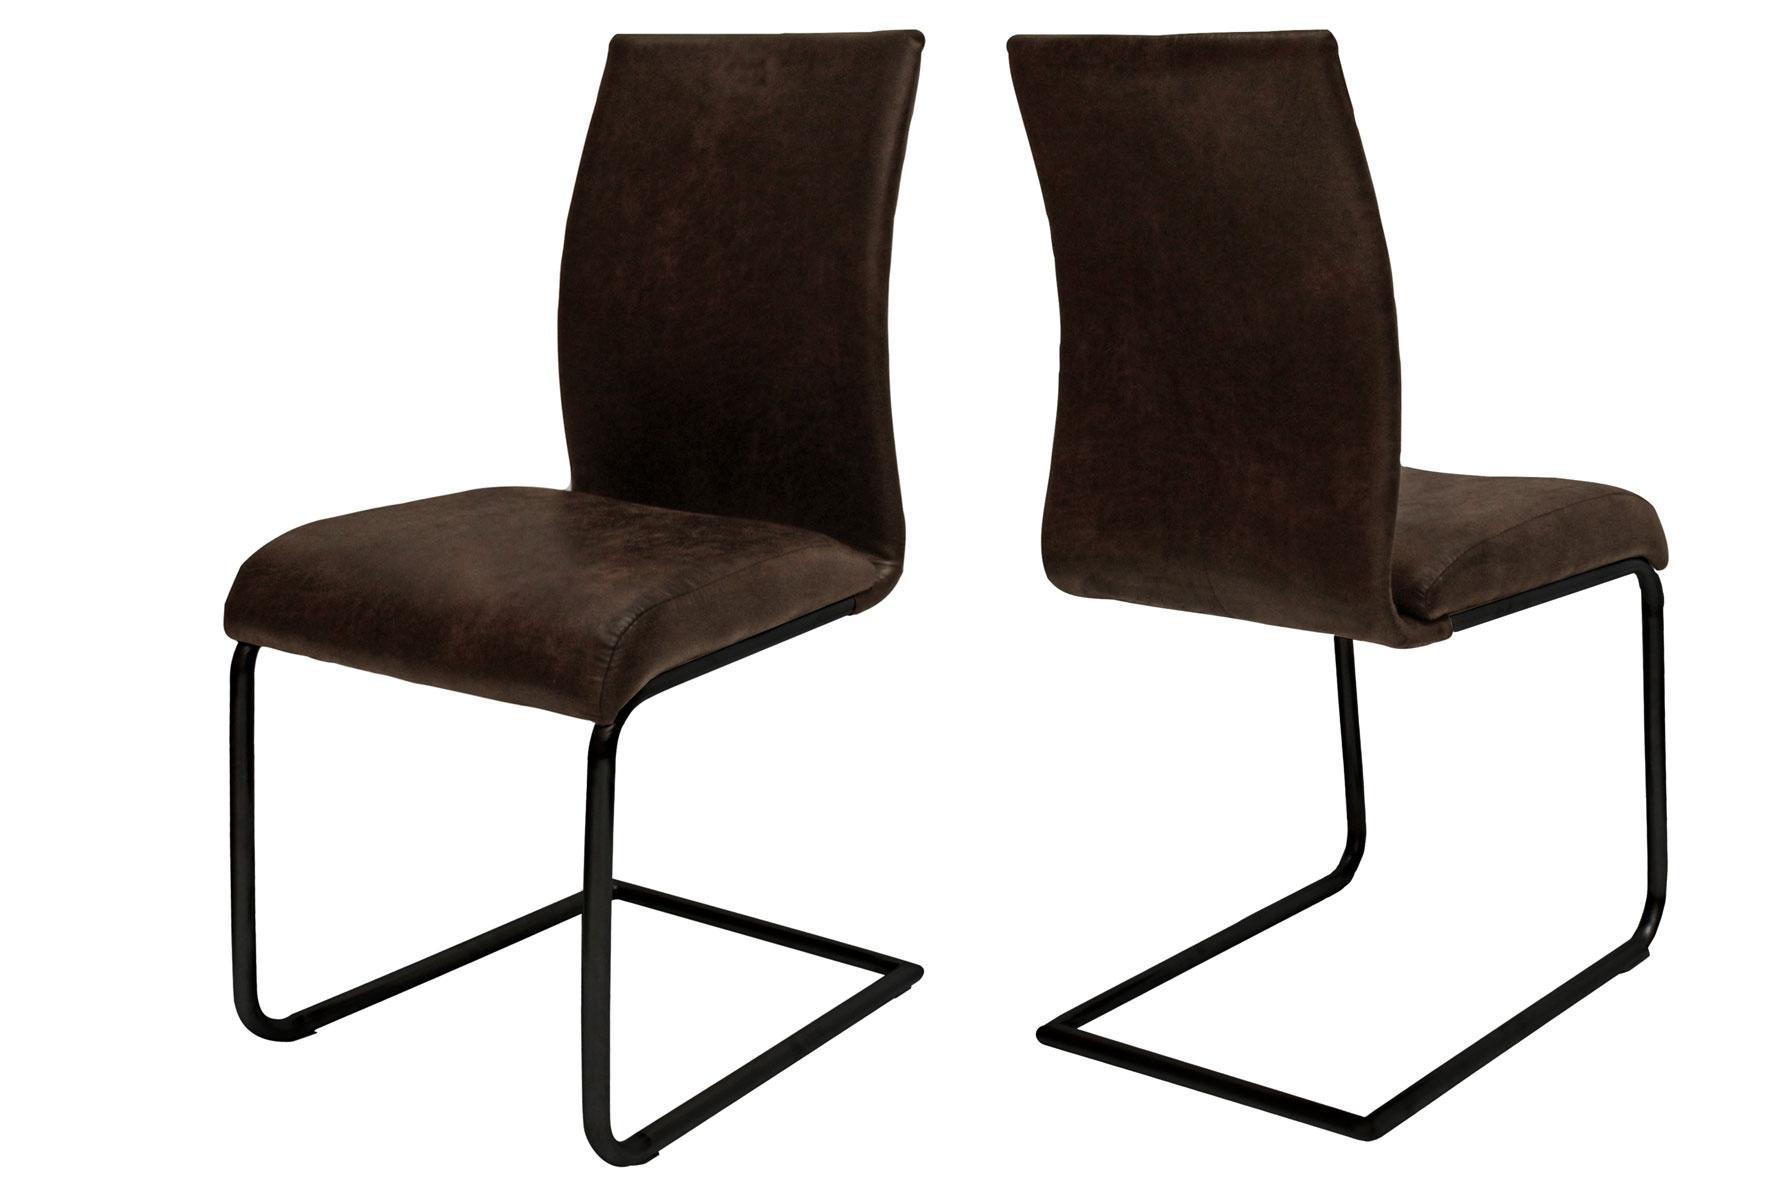 Jedálenská stolička Gwan / tmavo hnedá